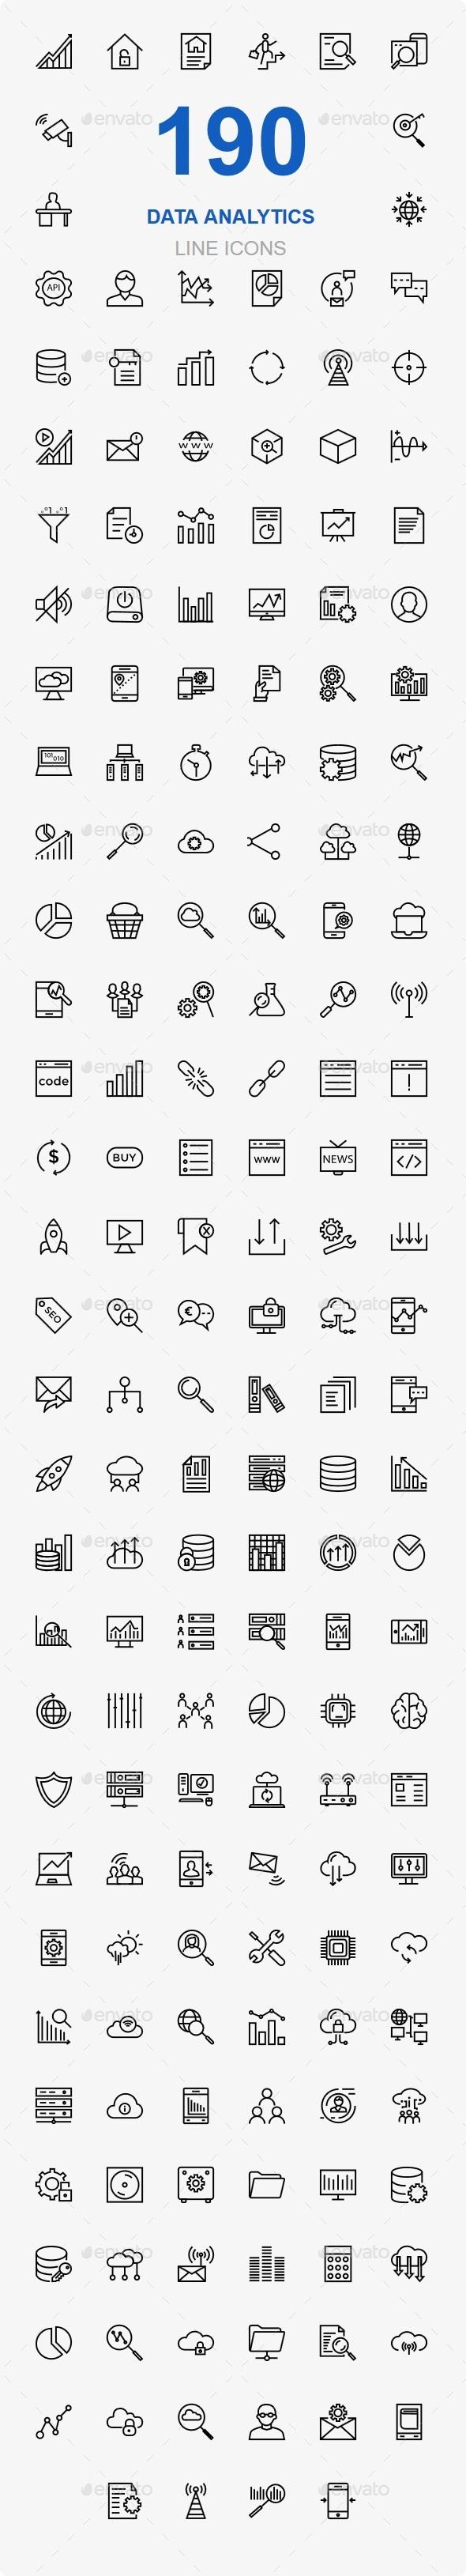 GraphicRiver Data Analytics and Data Storage line icons 20682608